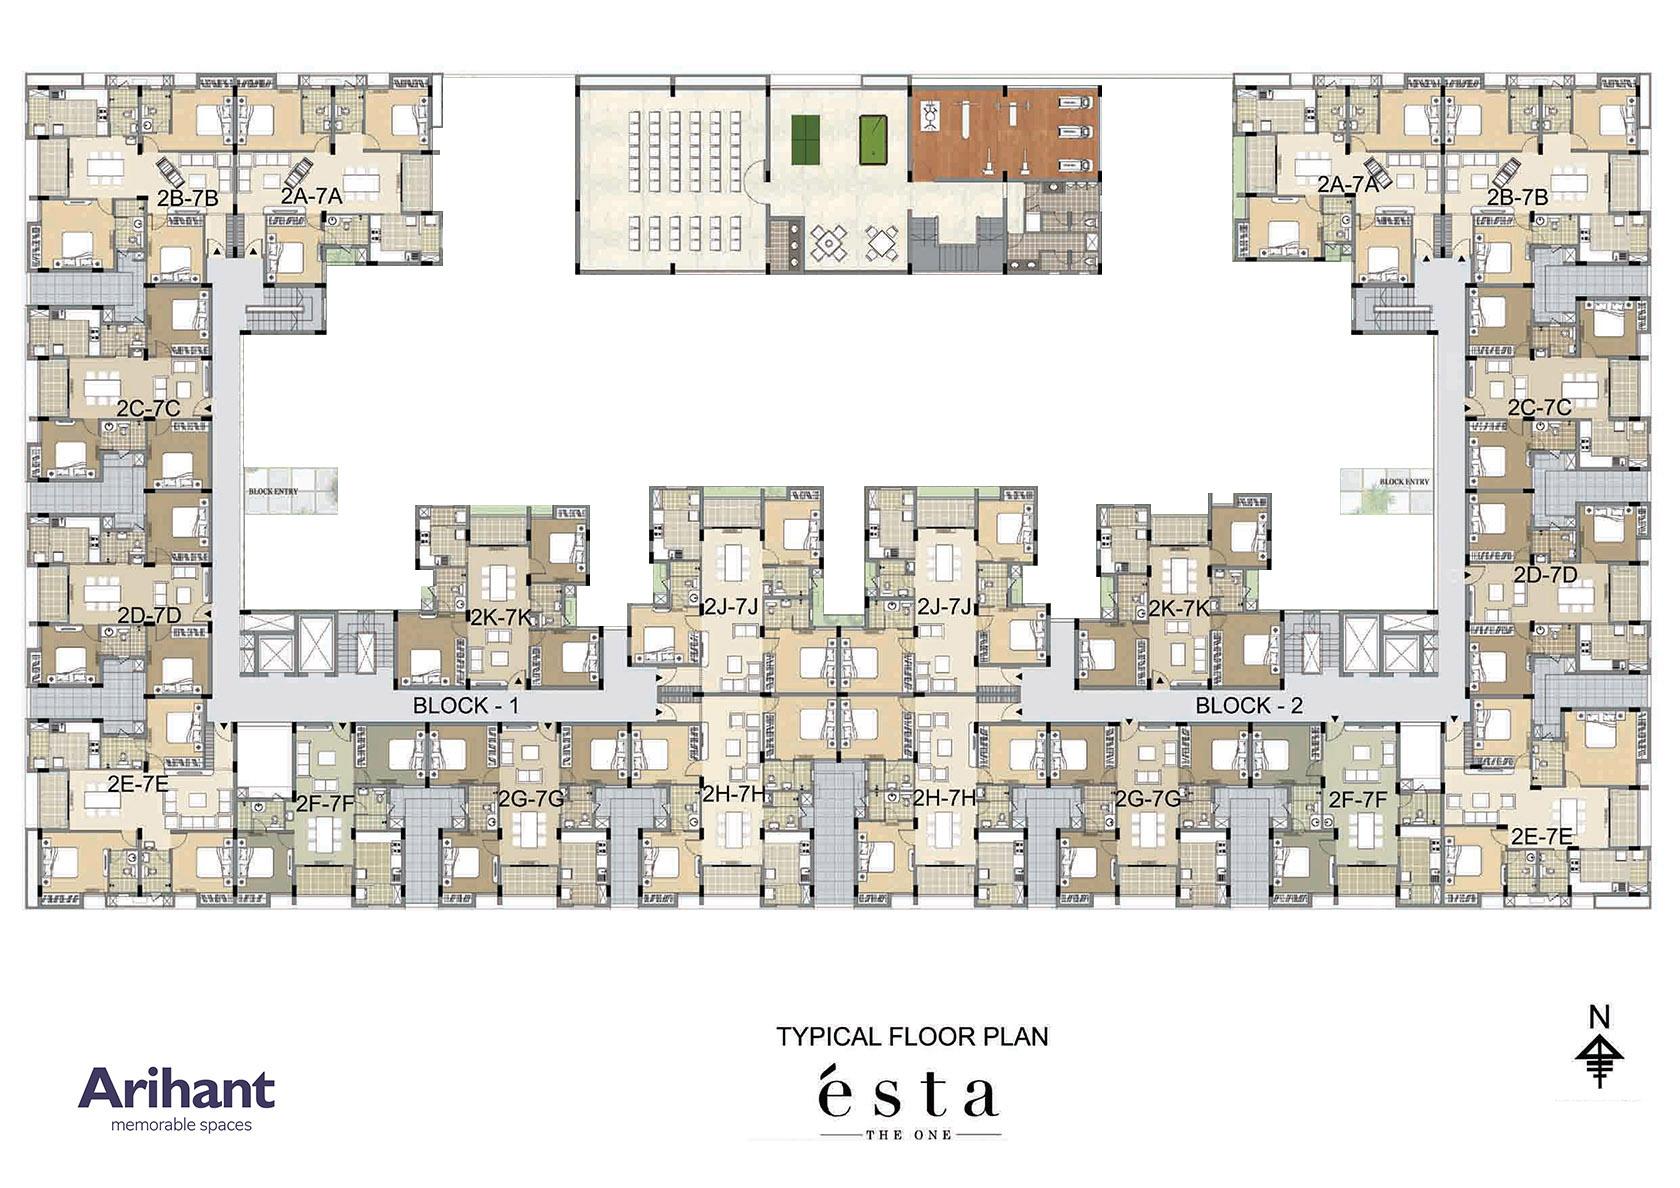 Arihant - Esta_Typical Floor Plan-02